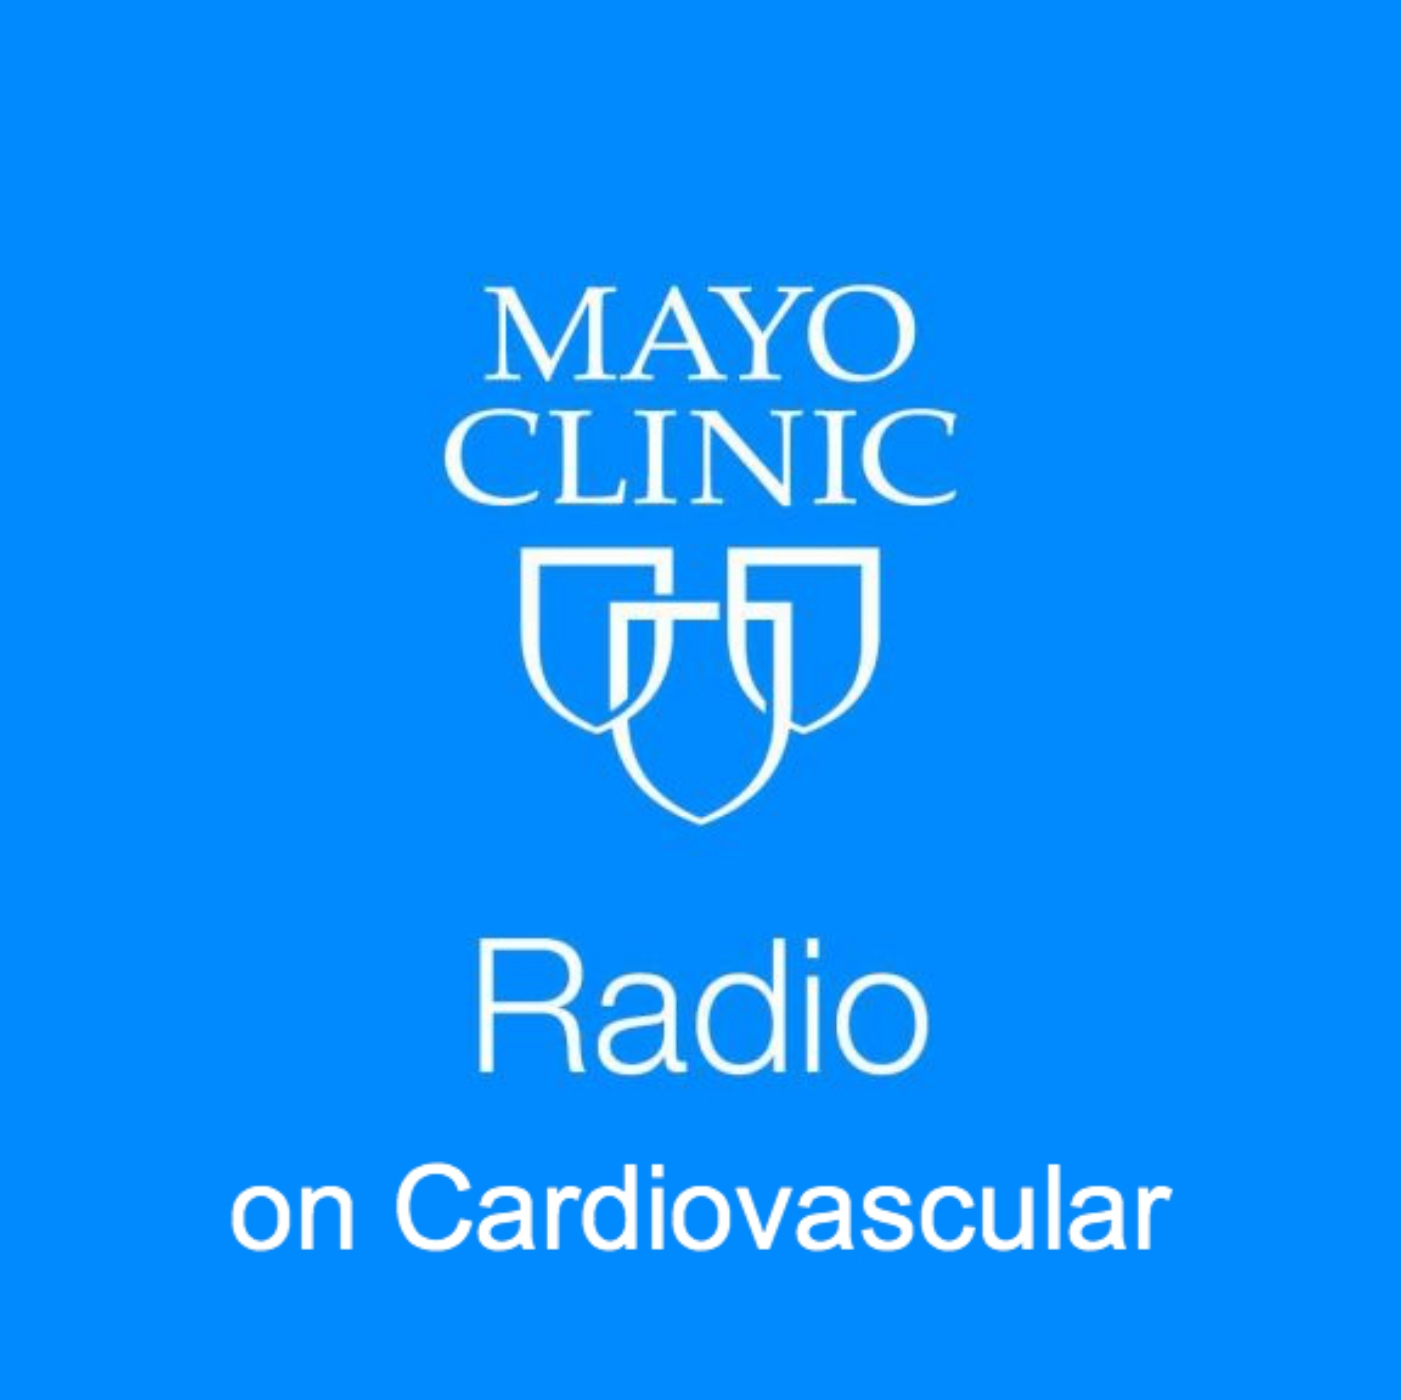 Mayo Clinic Radio on Cardiovascular